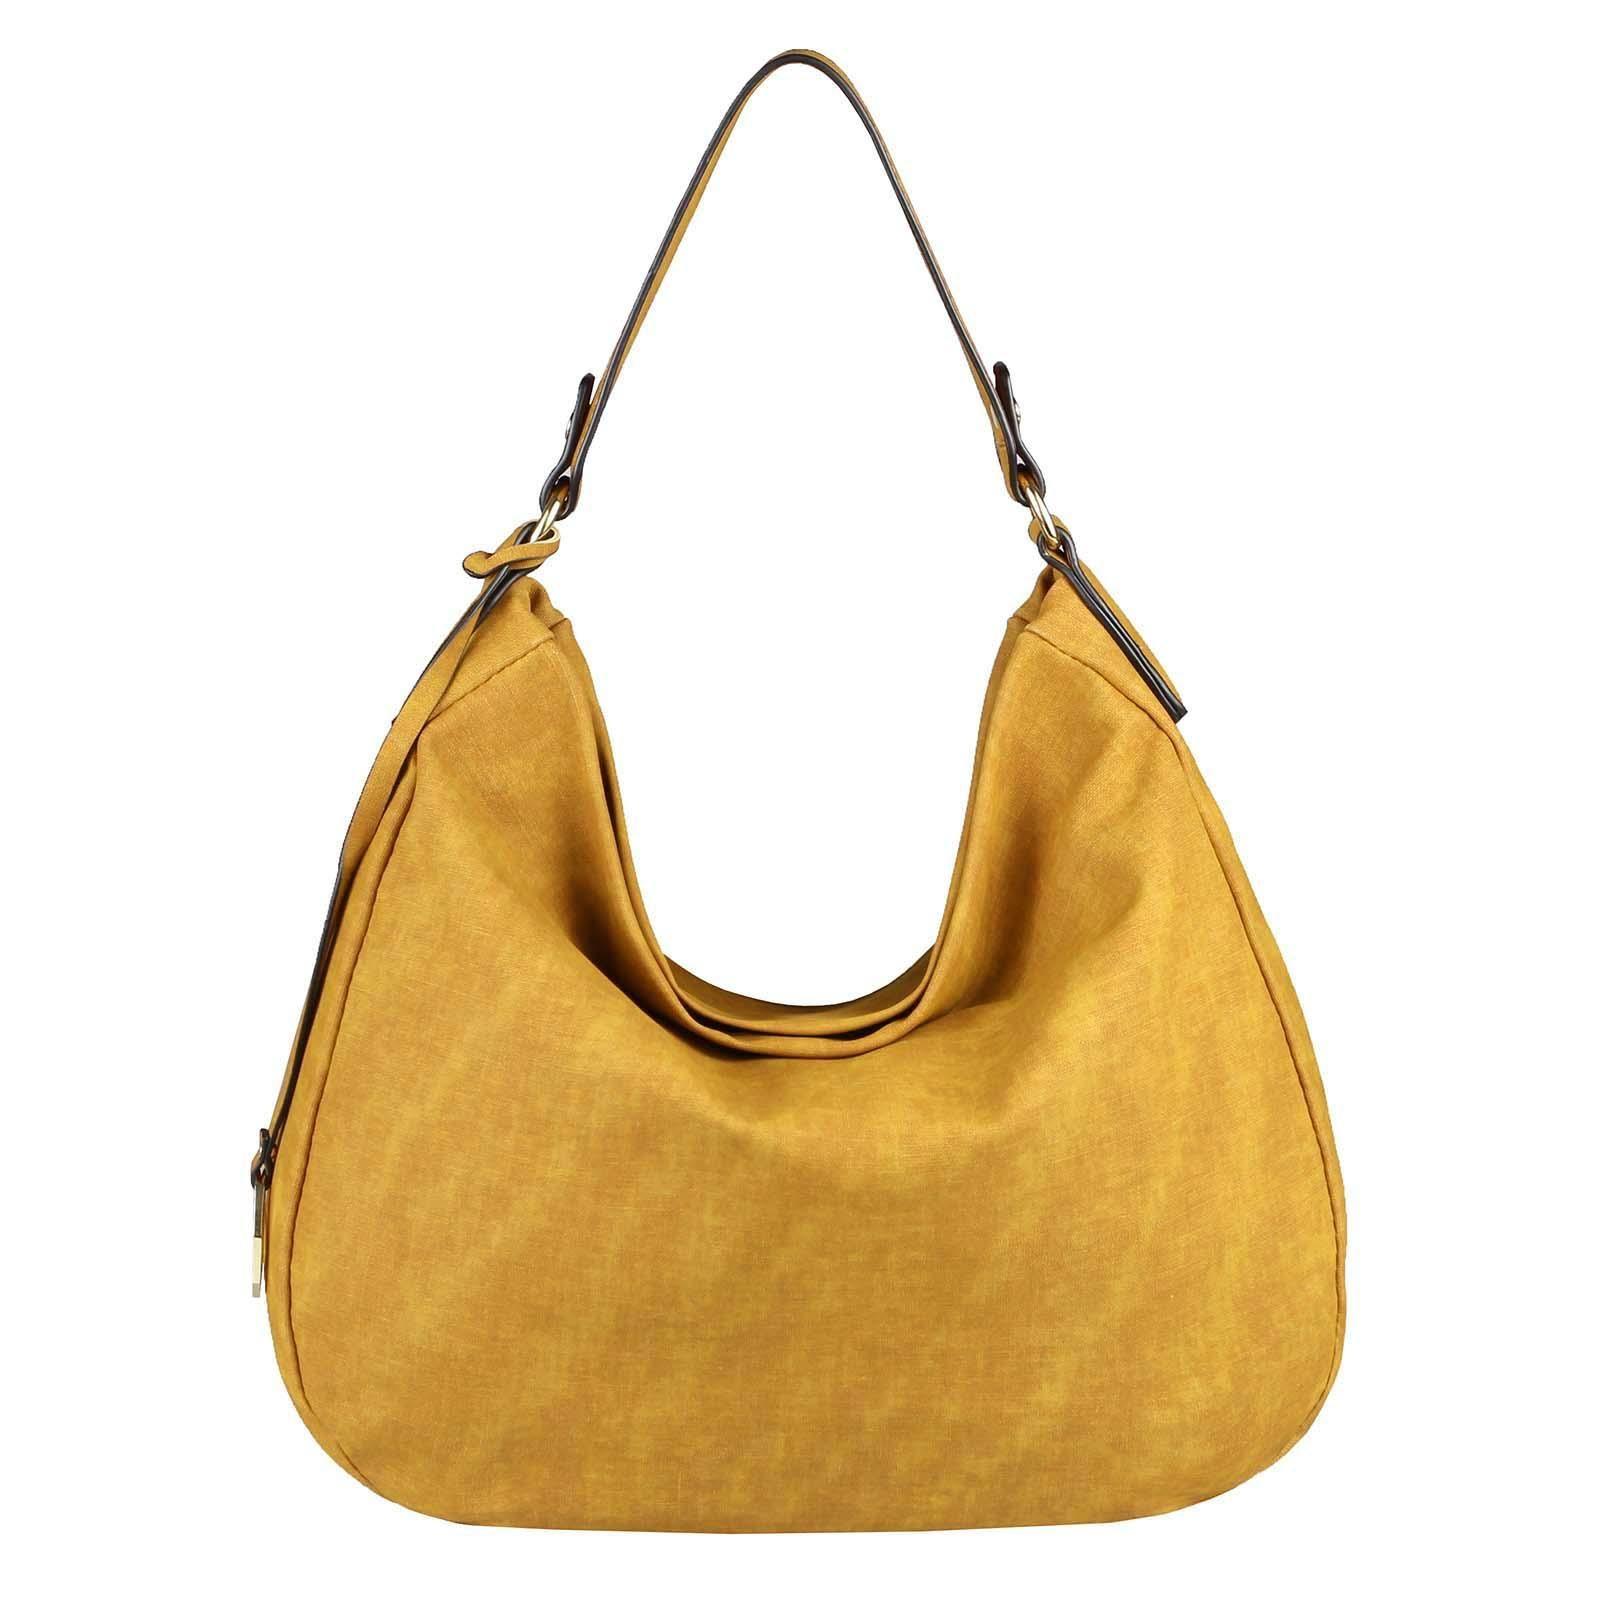 d6407cee2e5bf DAMEN HAND-TASCHE SHOPPER Hobo-Bag Henkeltasche Schultertasche Umhängetasche  CrossOver Damentasche Leder optik